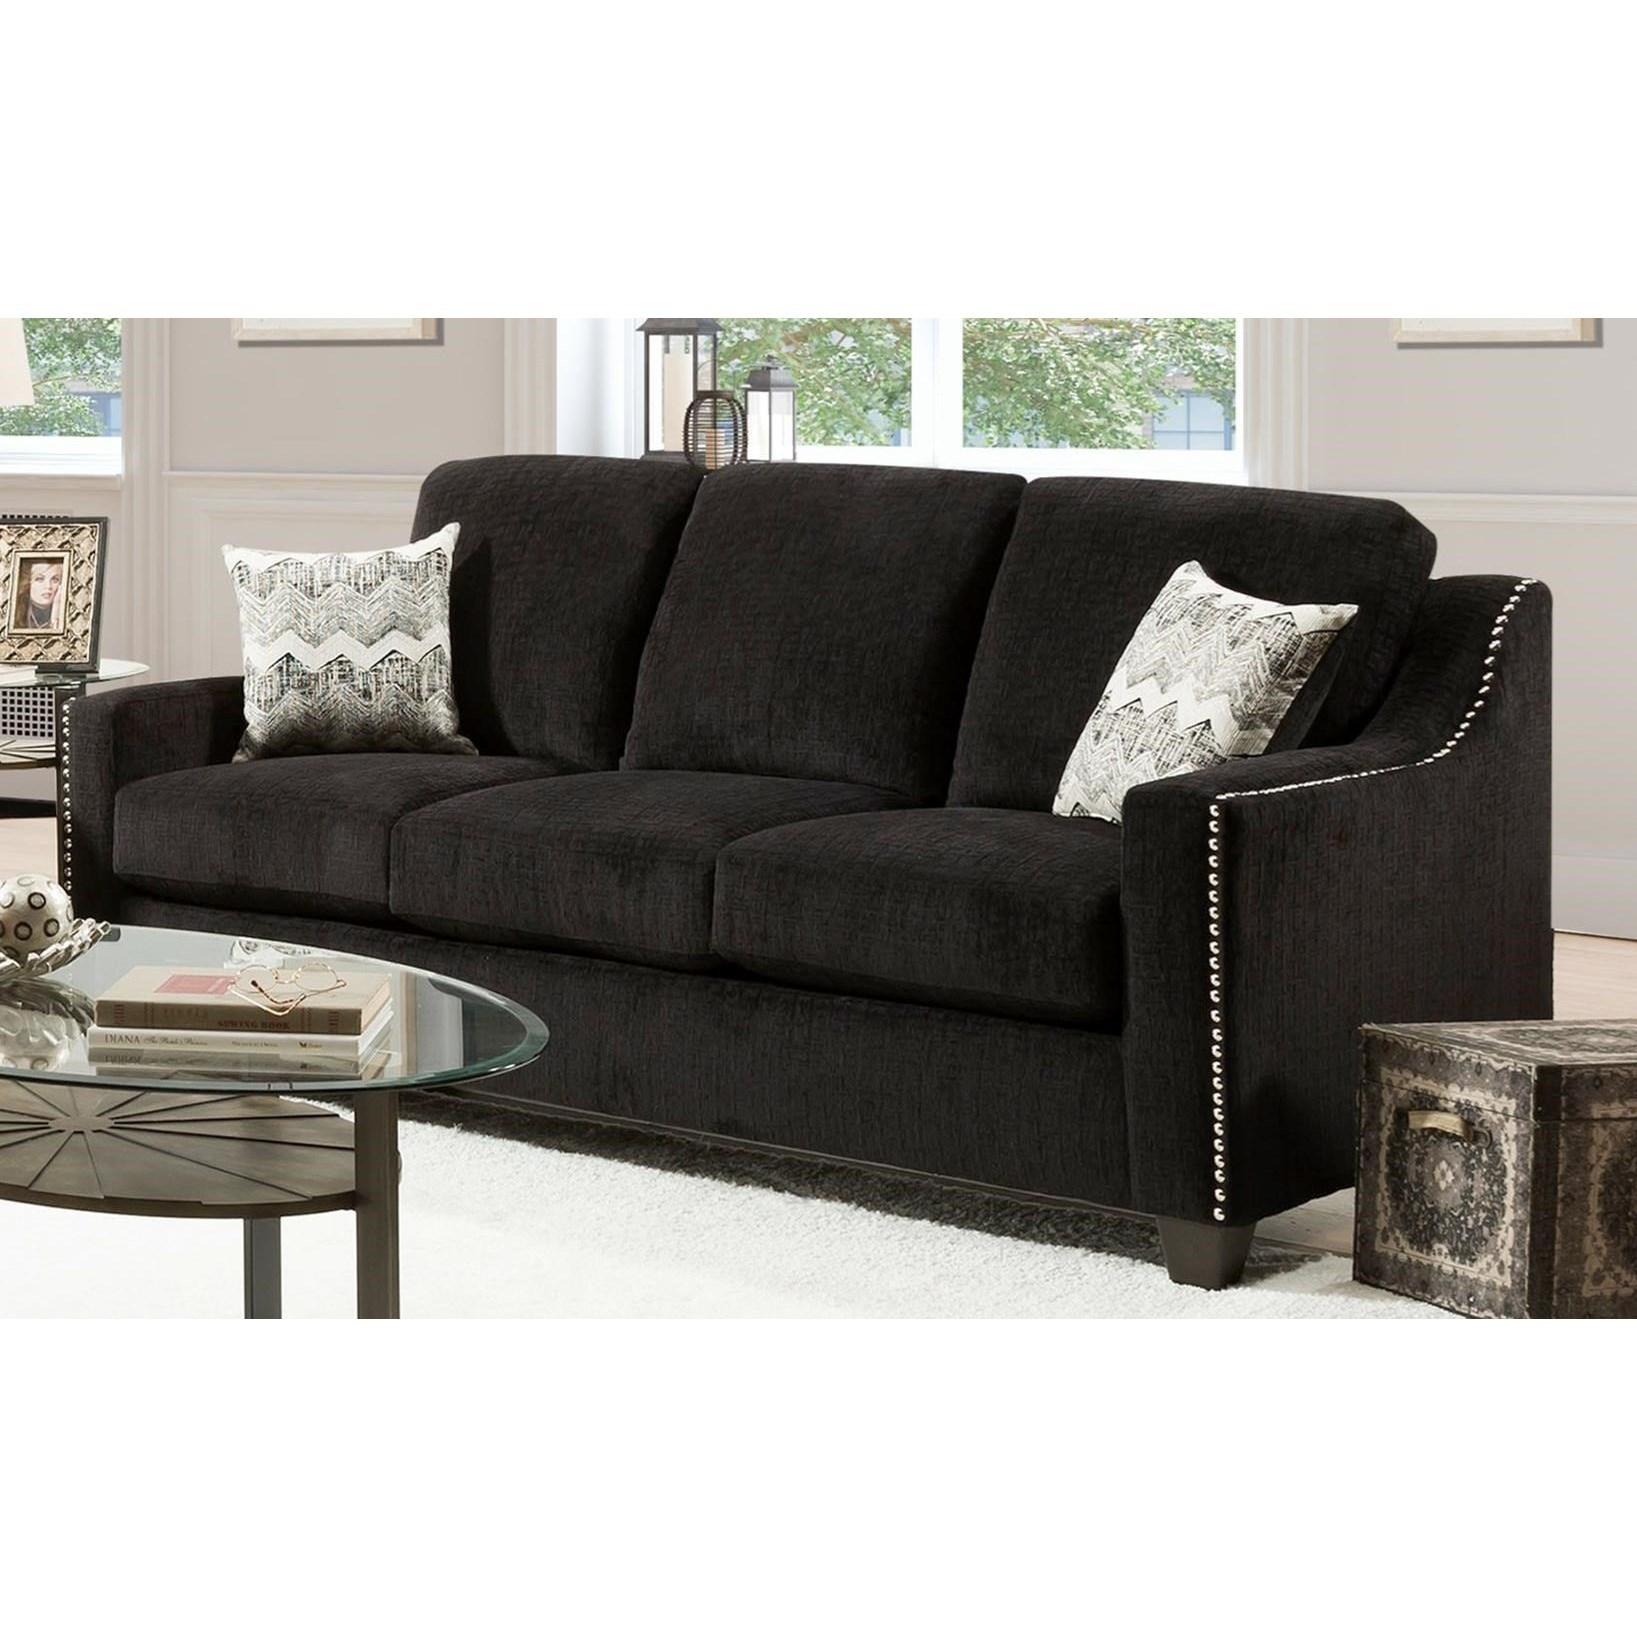 3470 Sofa by Peak Living at Prime Brothers Furniture